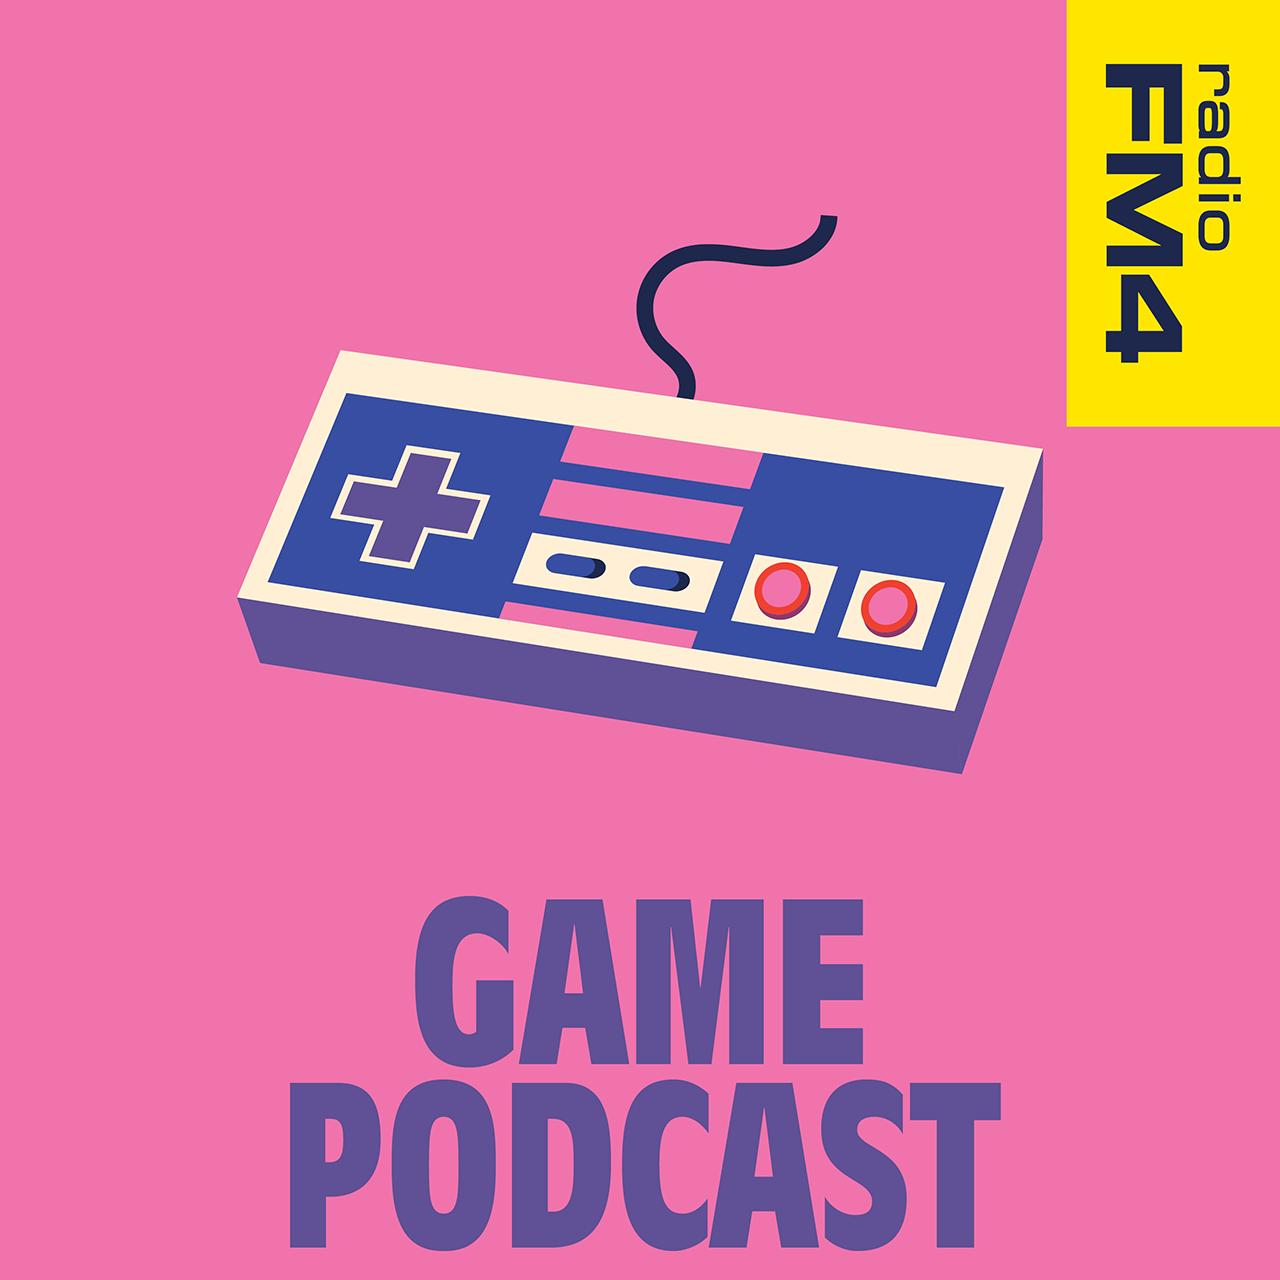 FM4 Podcast Game Podcast (Gamepodcast)